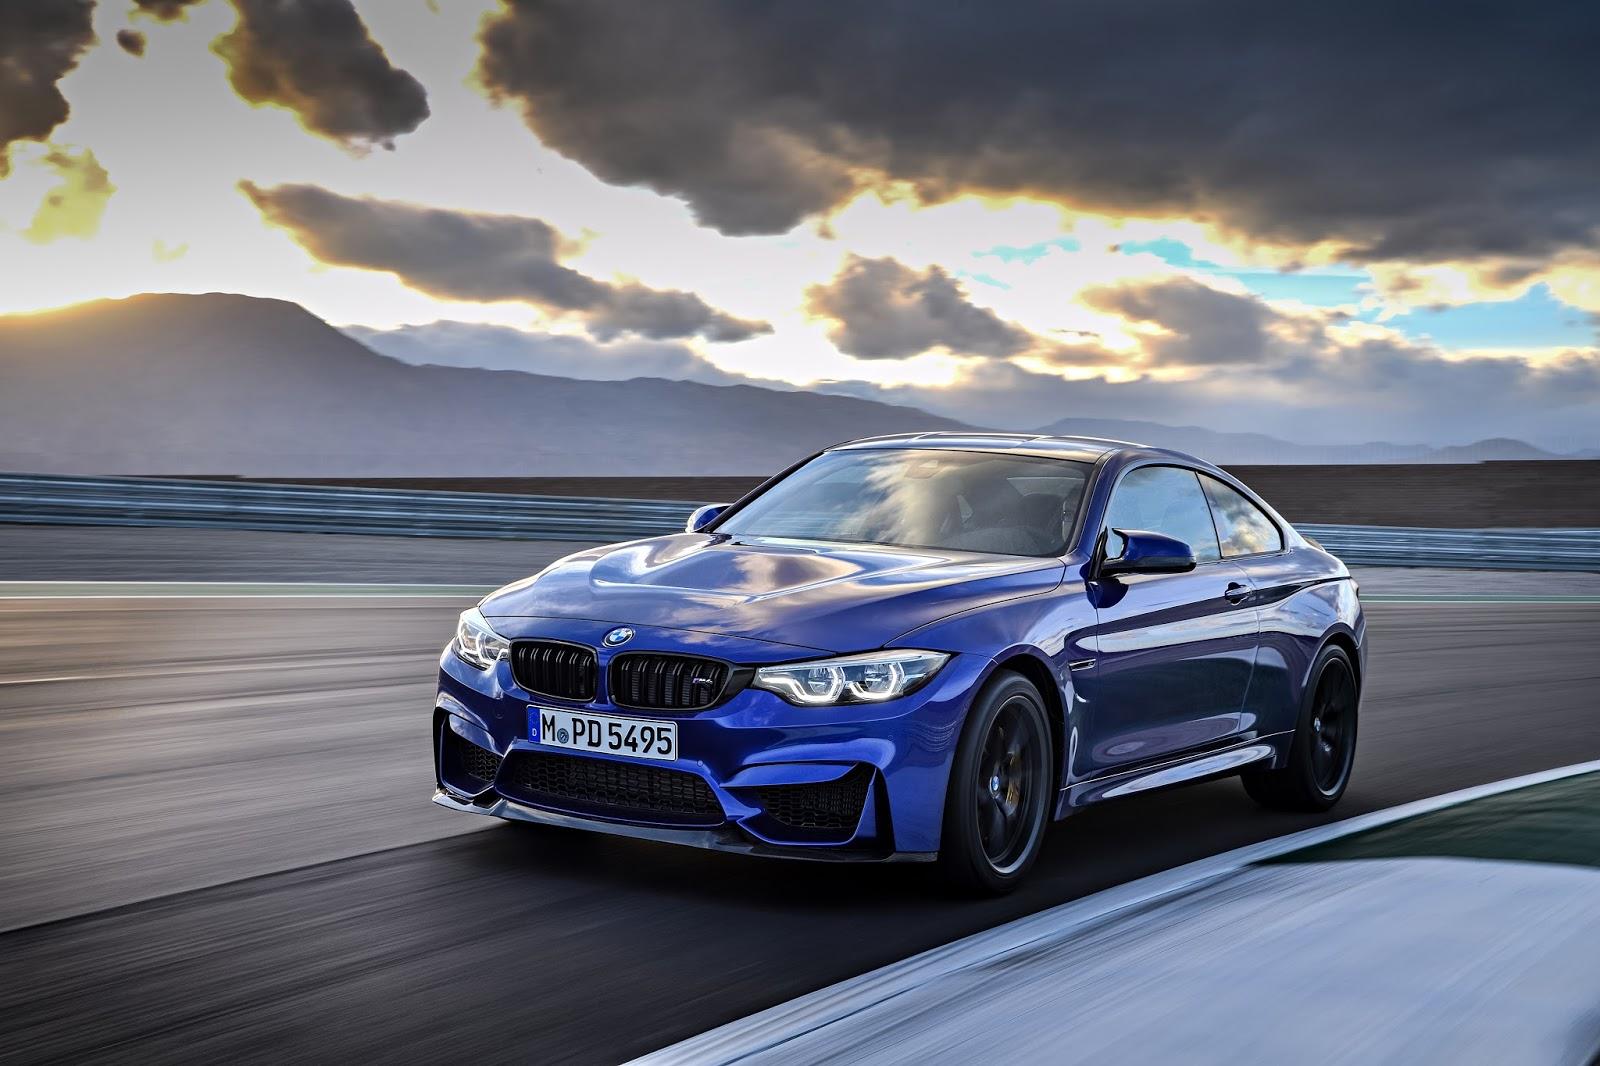 P90251045 highRes the new bmw m4 cs 04 Η περιορισμένης παραγωγής BMW M4 ClubSport δική σας με 116.900 ευρώ BMW, BMW M, BMW M4, BMW M4 CS, BMW Motorsport, clubsport, COUPE, Limited edition, supercars, supersport, videos, Περιορισμένης παραγωγής